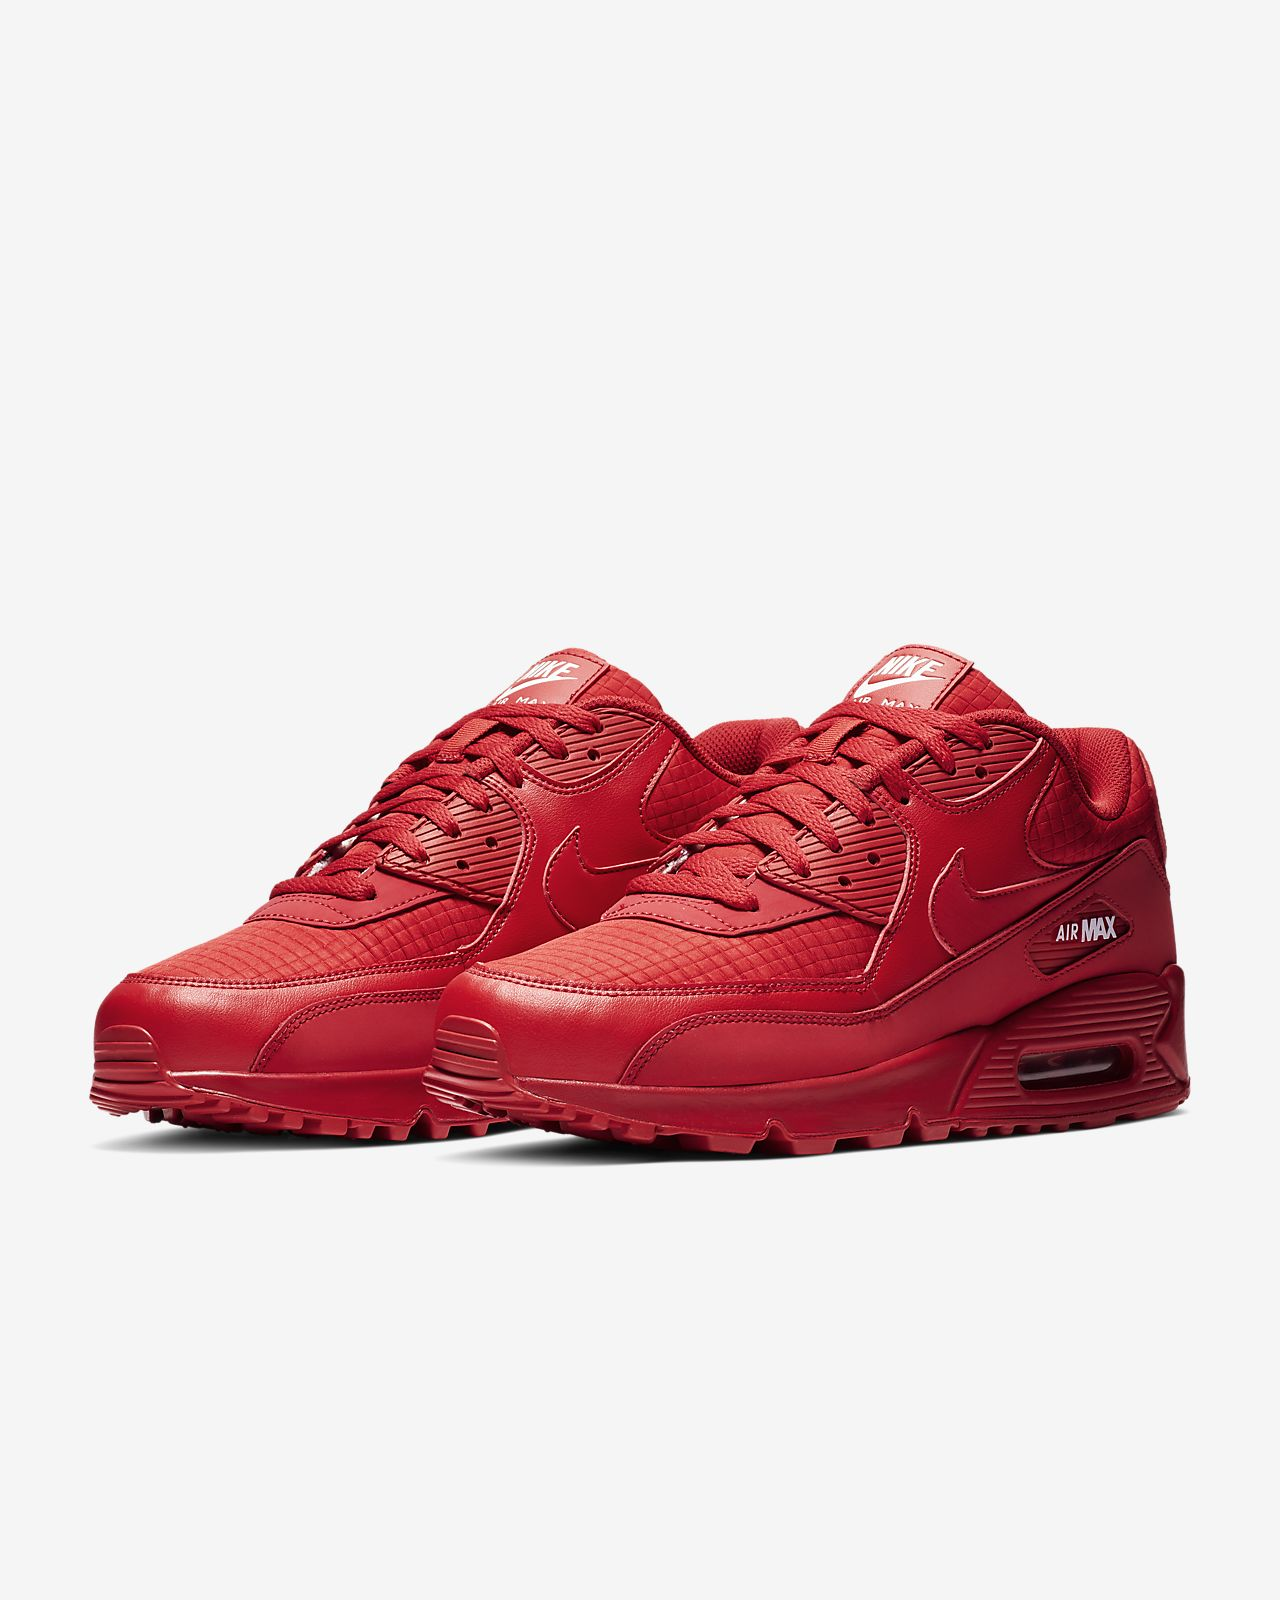 separation shoes 26752 f6251 ... Nike Air Max 90 Essential Men s Shoe